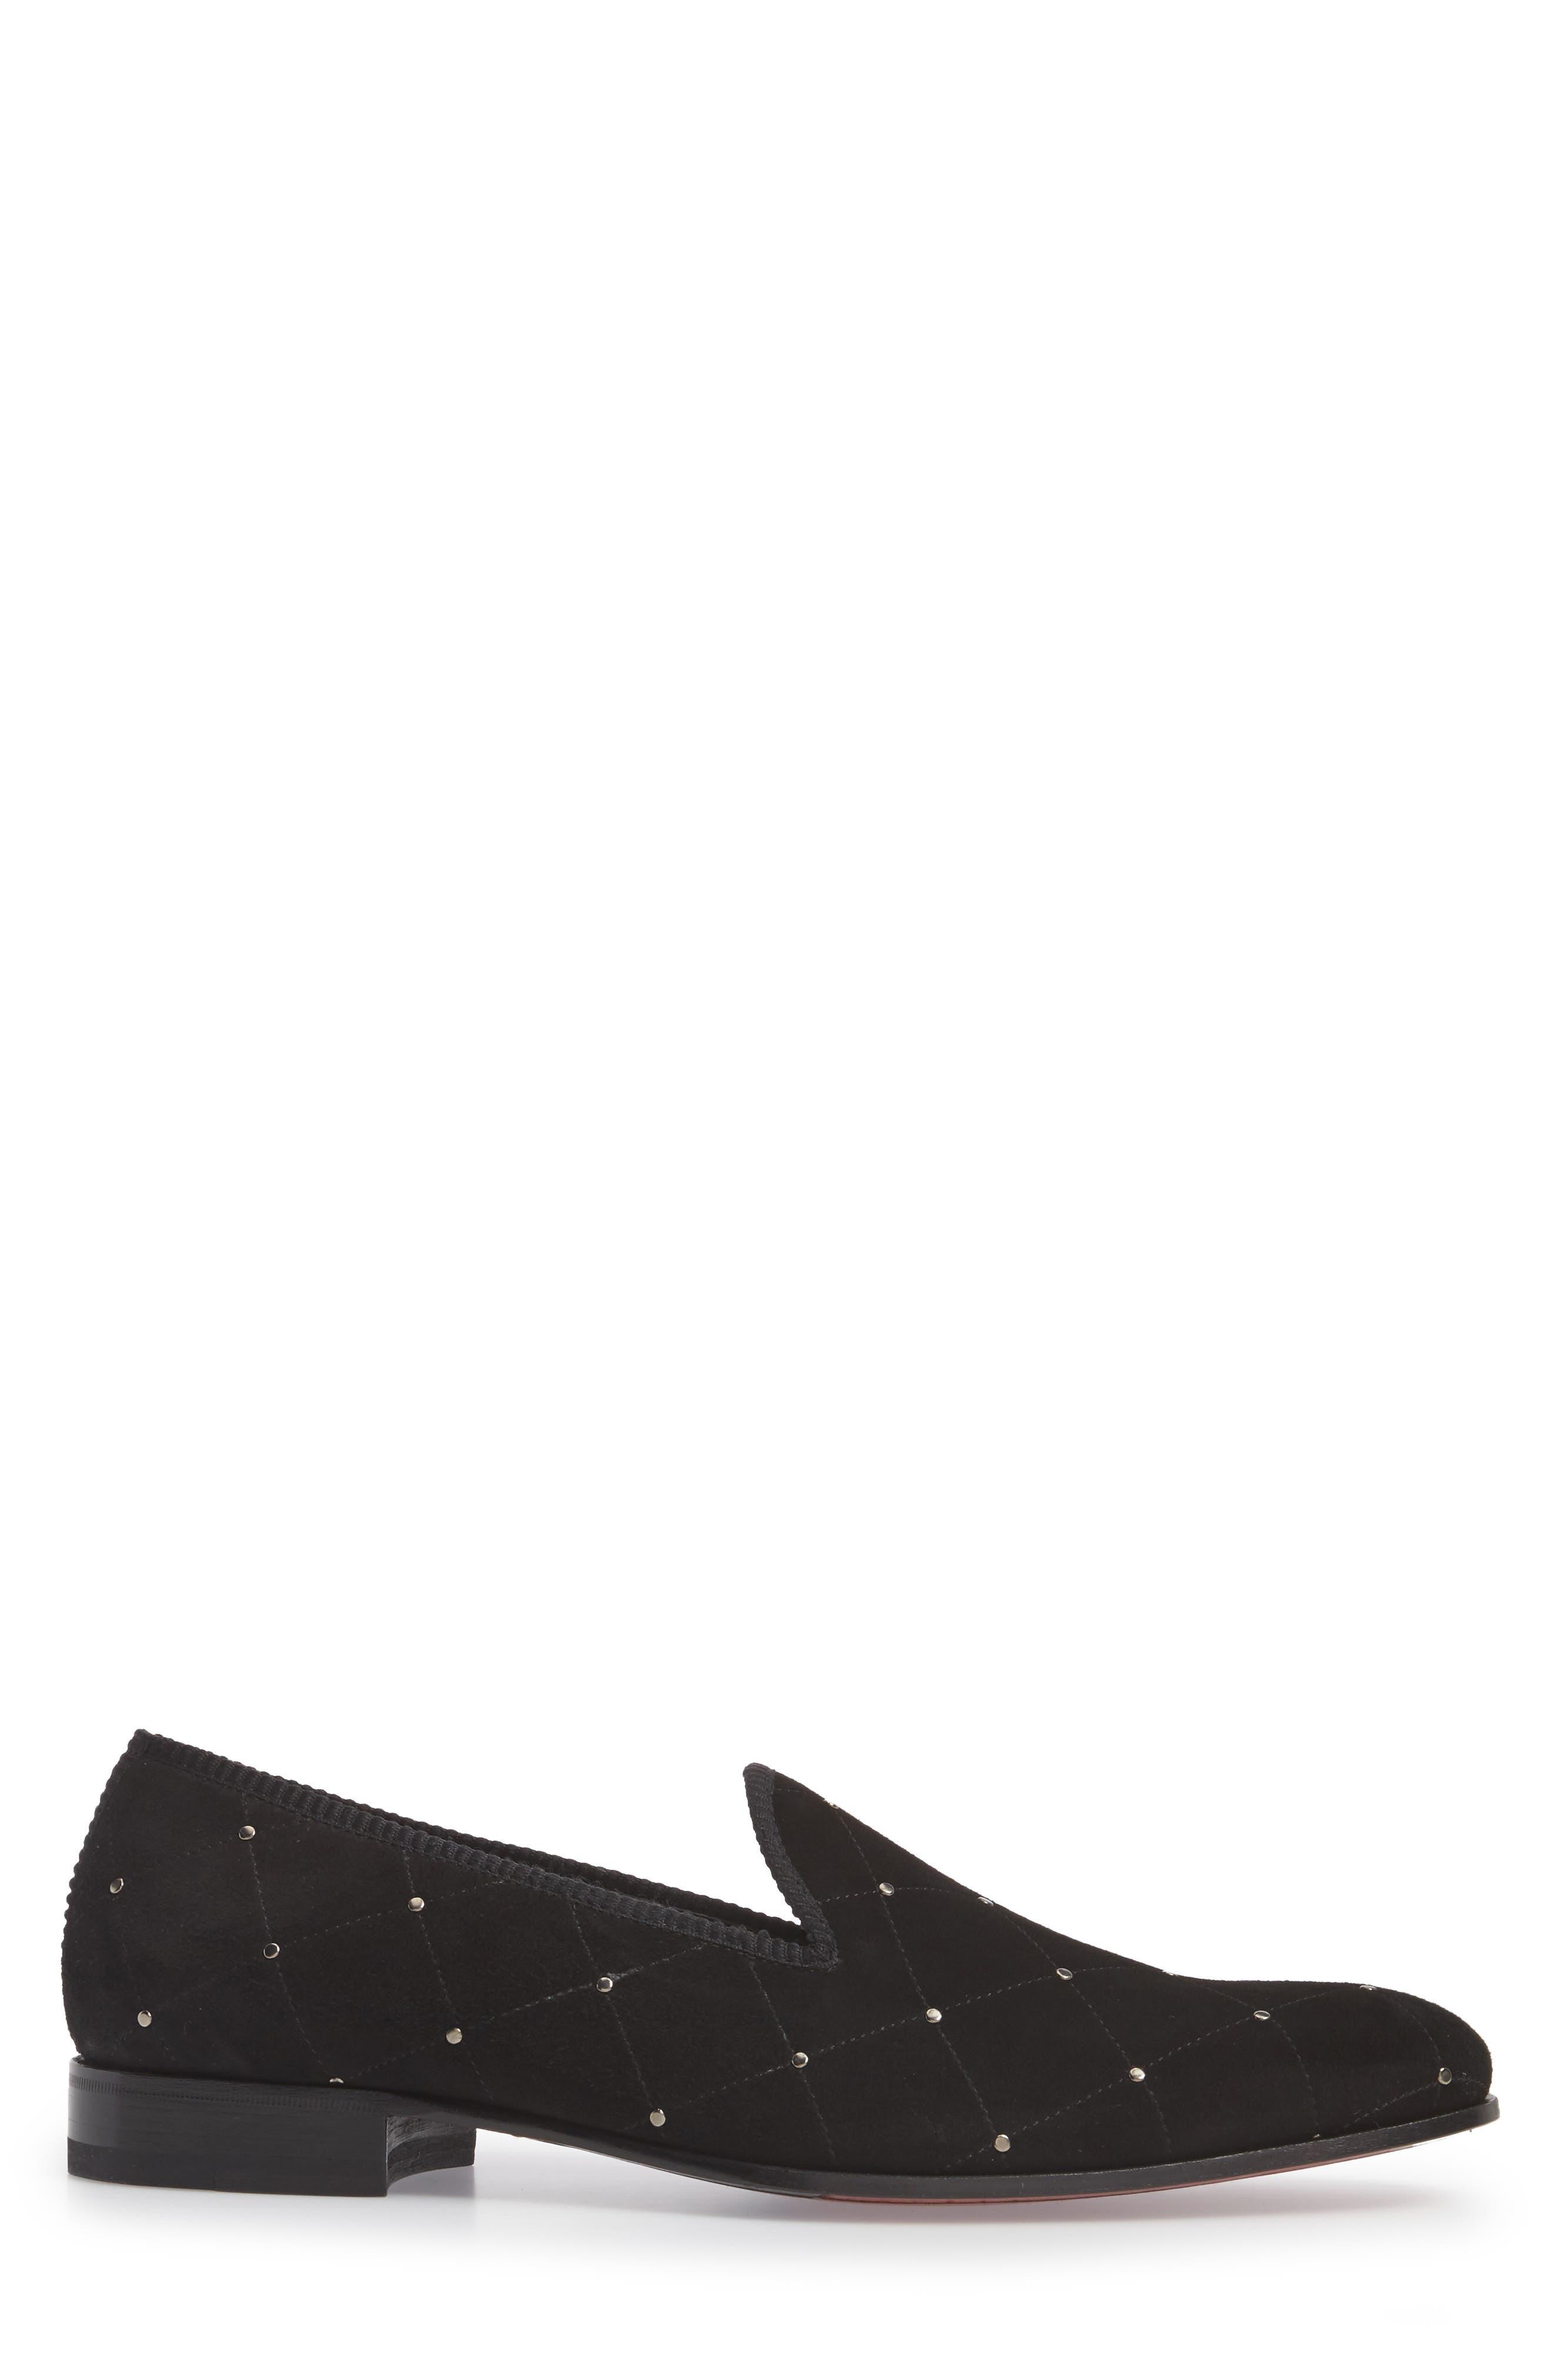 Talo Studded Venetian Loafer,                             Alternate thumbnail 3, color,                             Black Suede